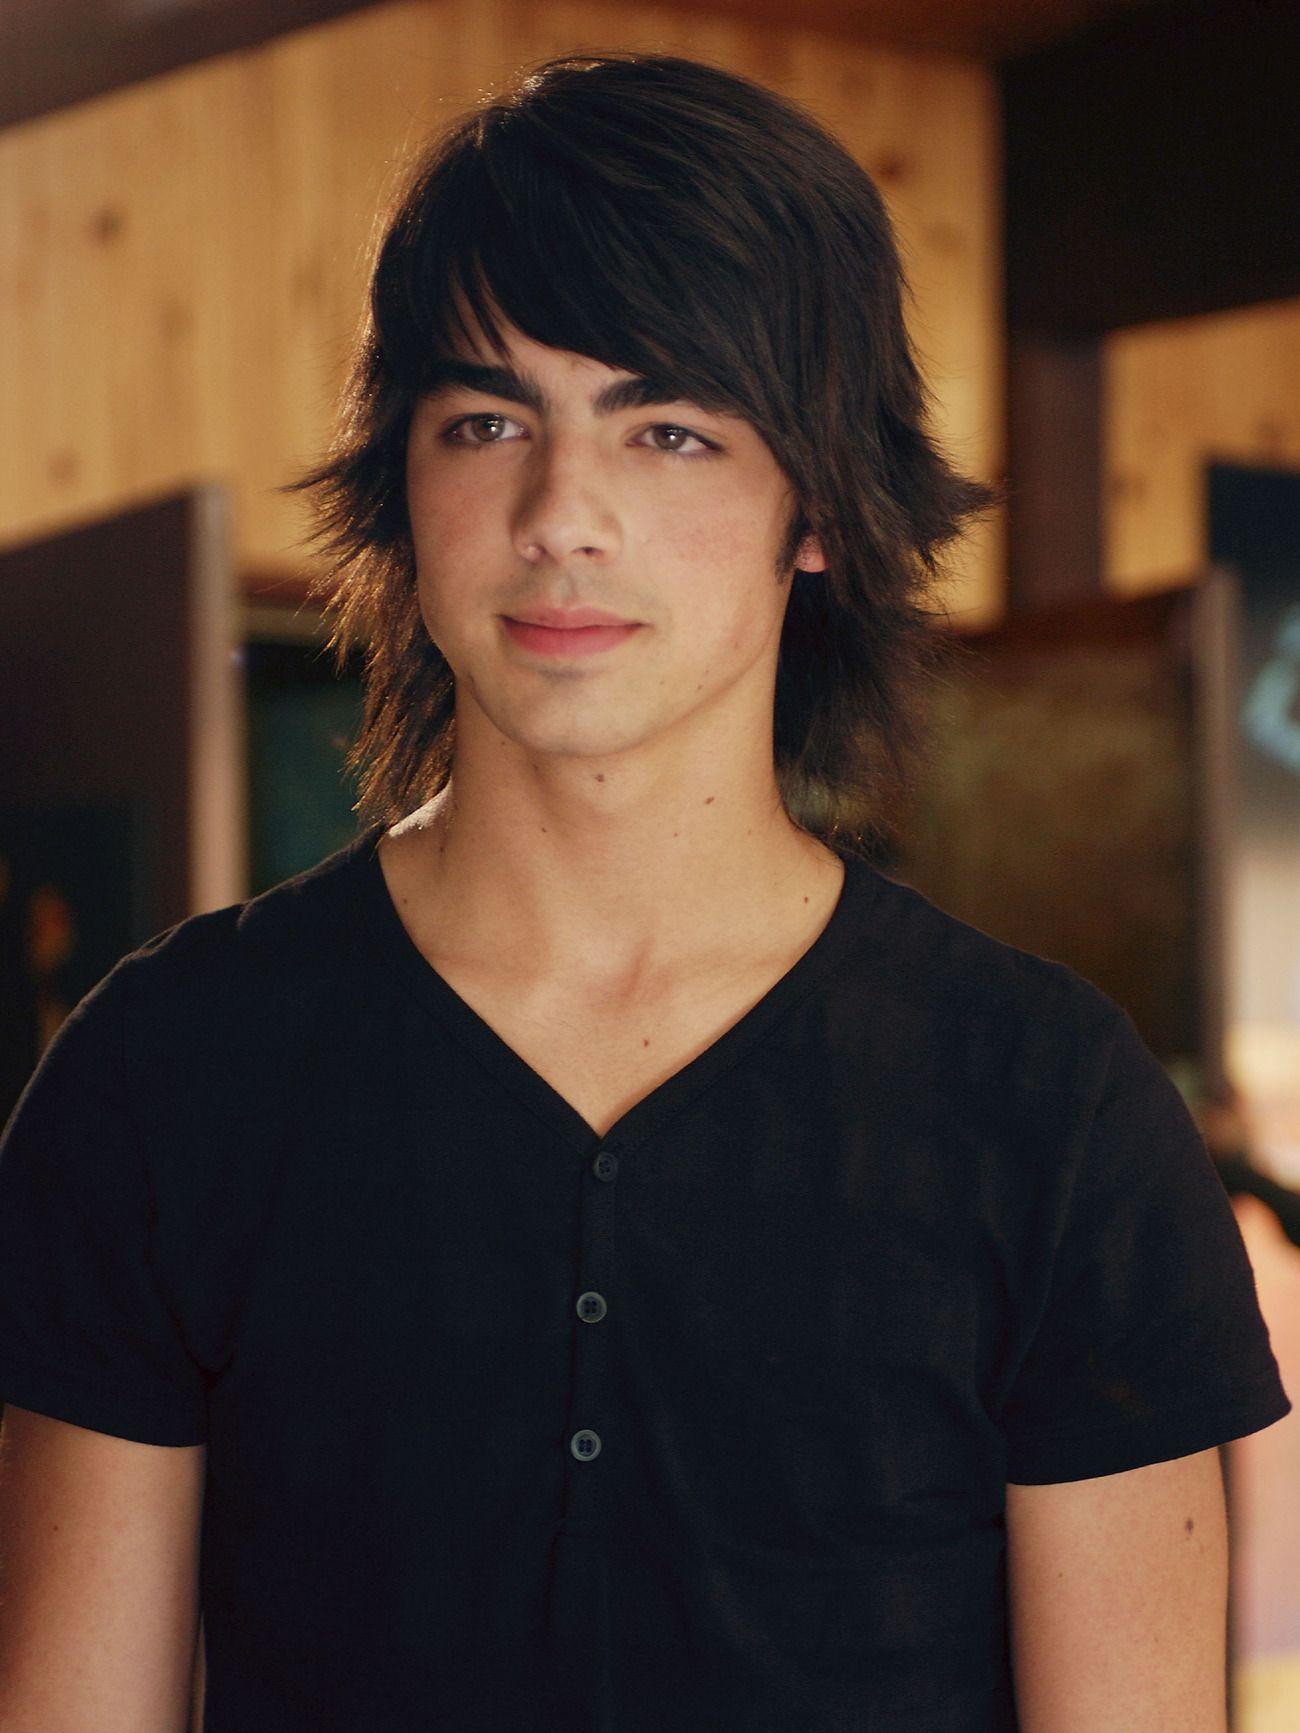 Joe Jonas Confirms He Lost His Virginity To Ashley Greene -2011